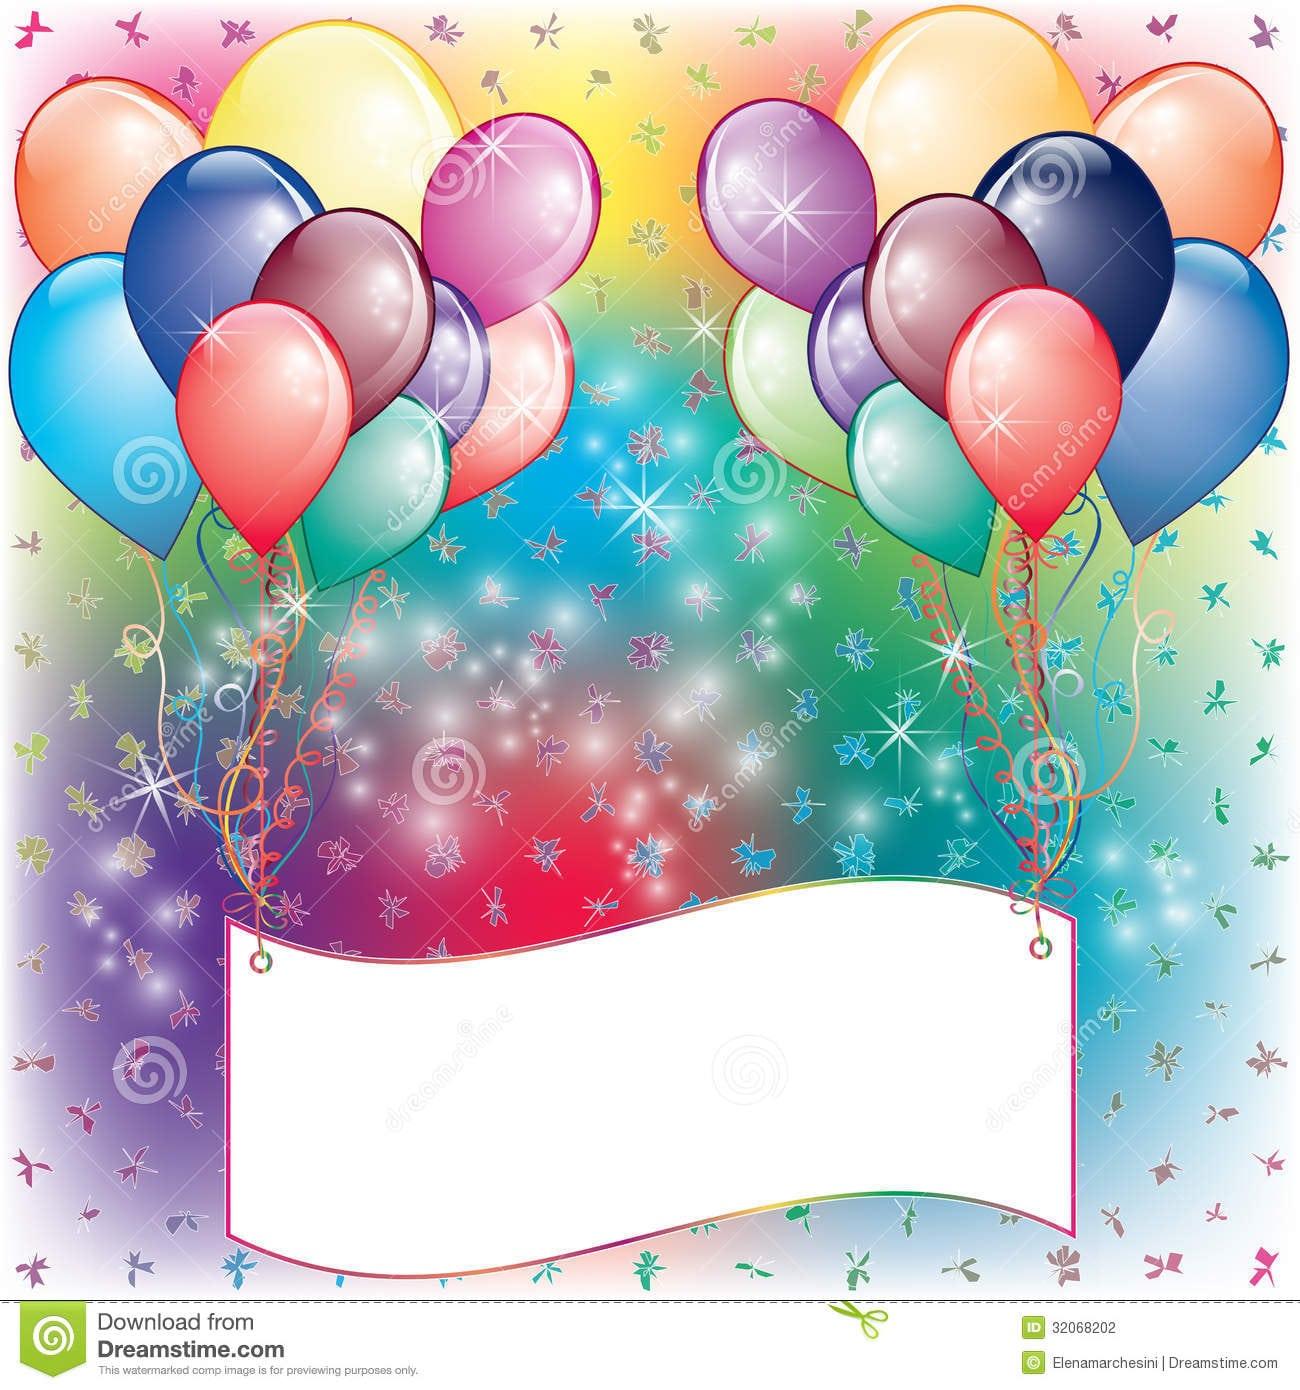 Balloon Party Invitations - Mickey Mouse Invitations Templates